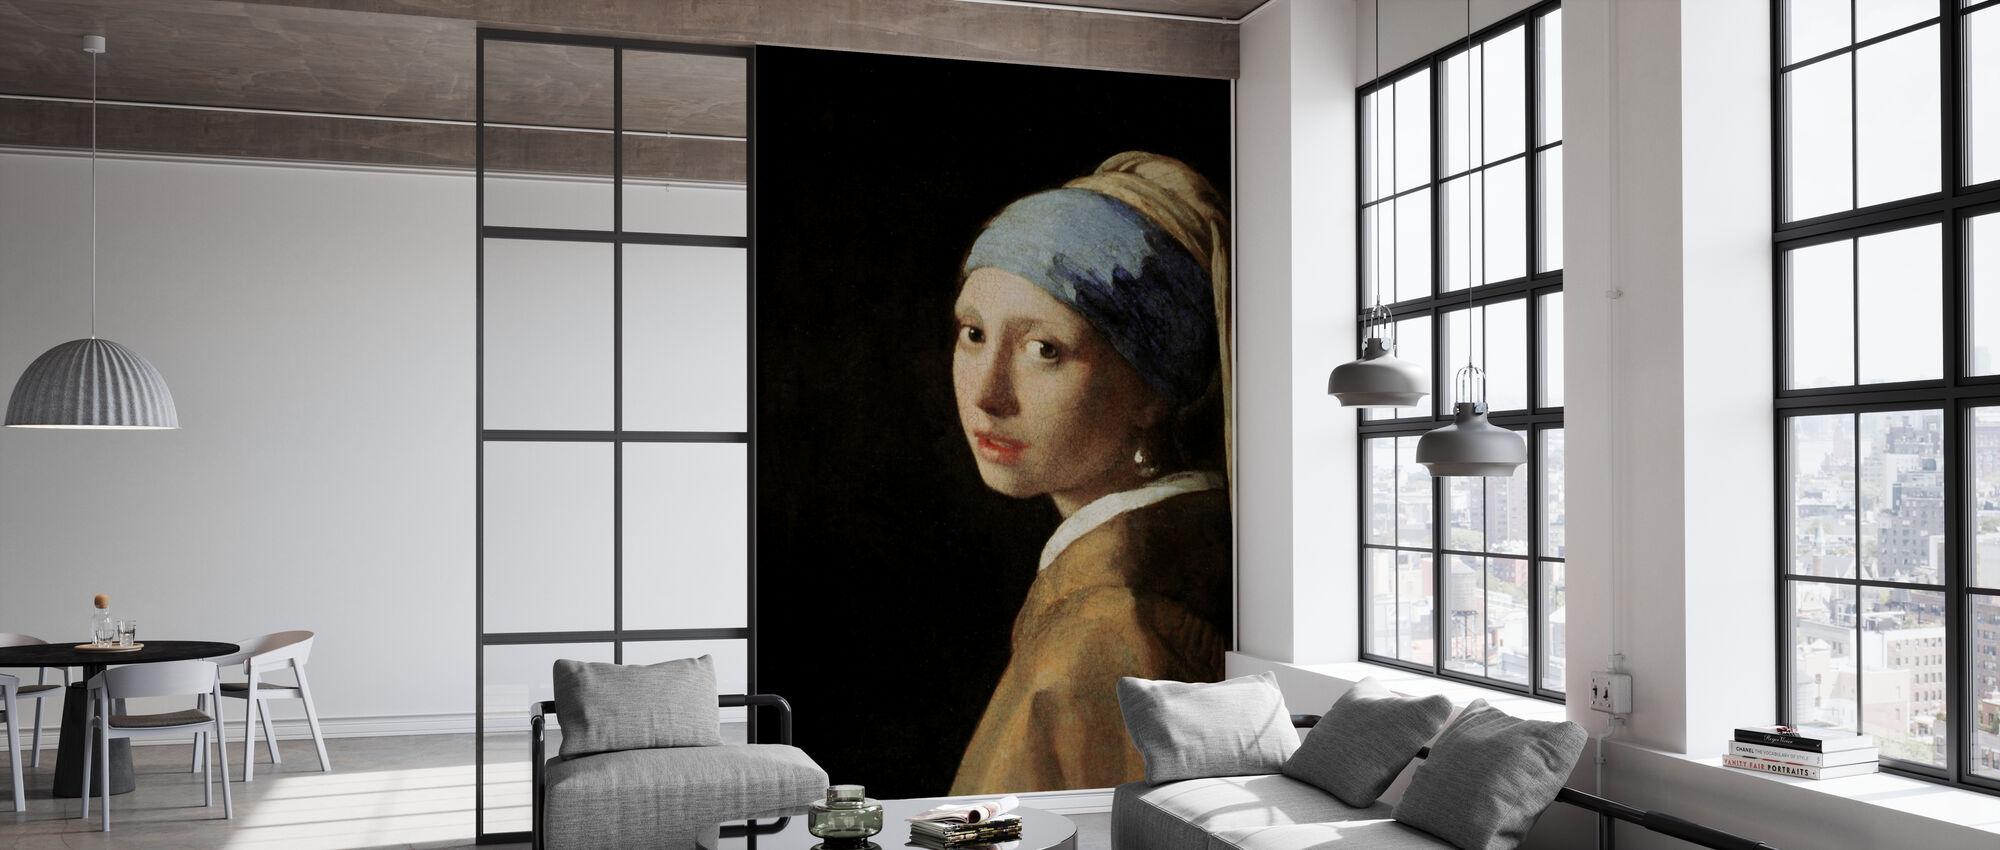 Girl with a Pearl Earring, Jan Vermeer - Wallpaper - Office